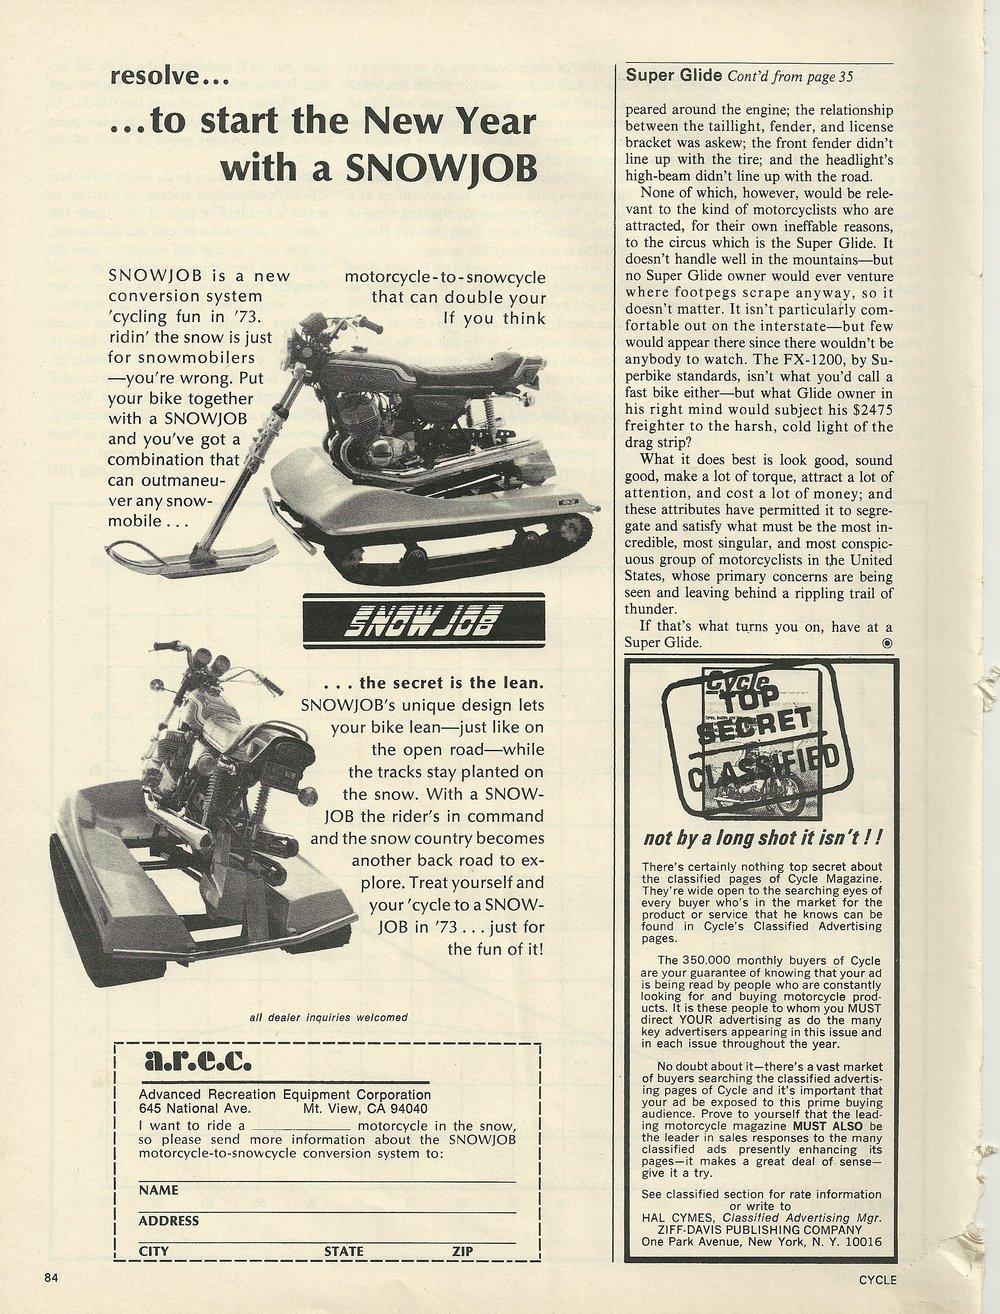 1973 Harley FX1200 road test 6.JPG